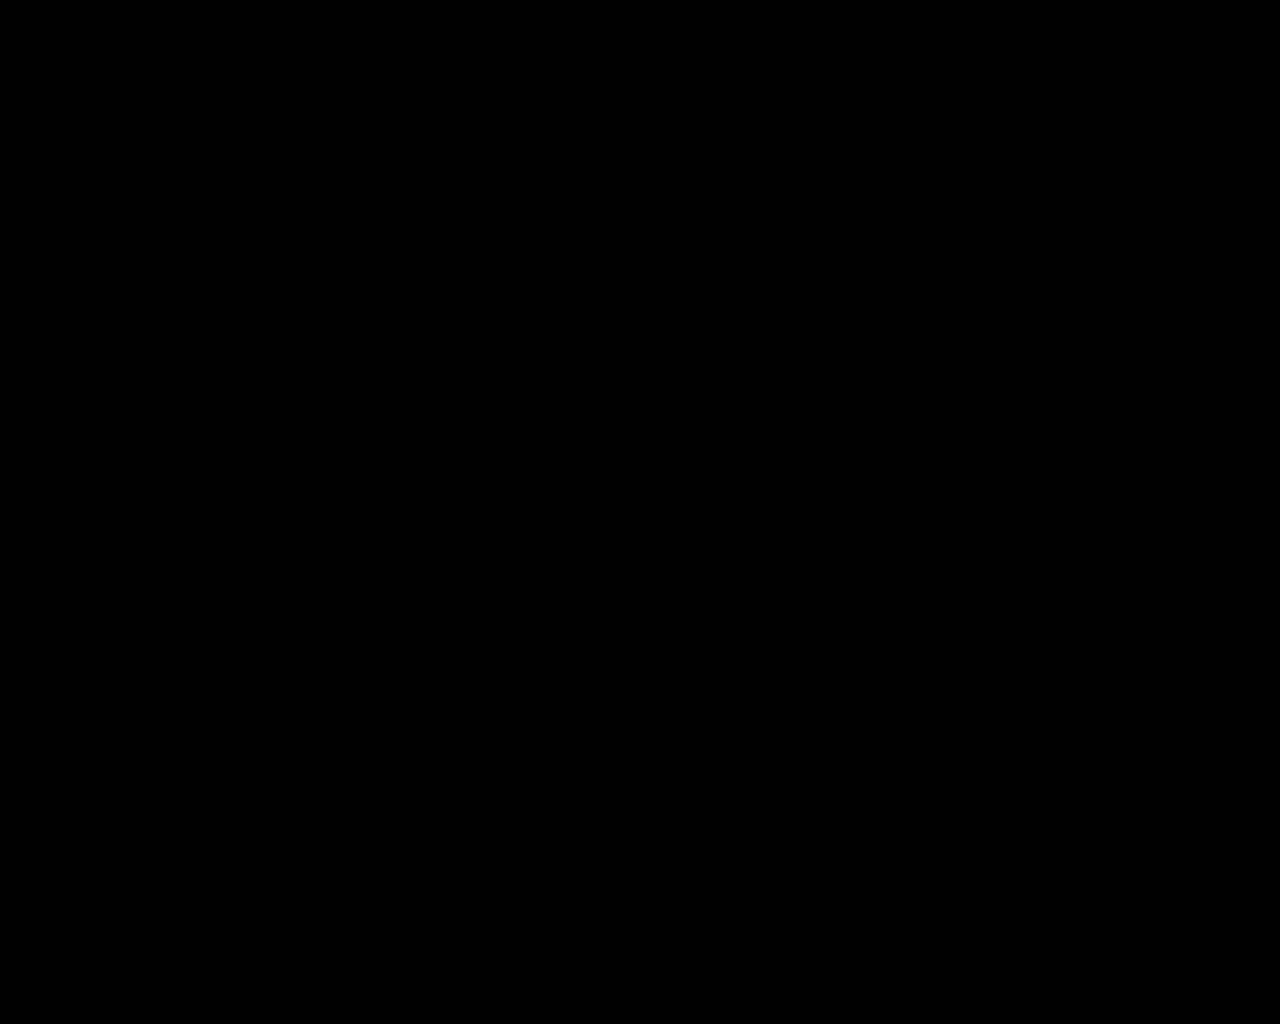 [75+] All Black Backgrounds on WallpaperSafari